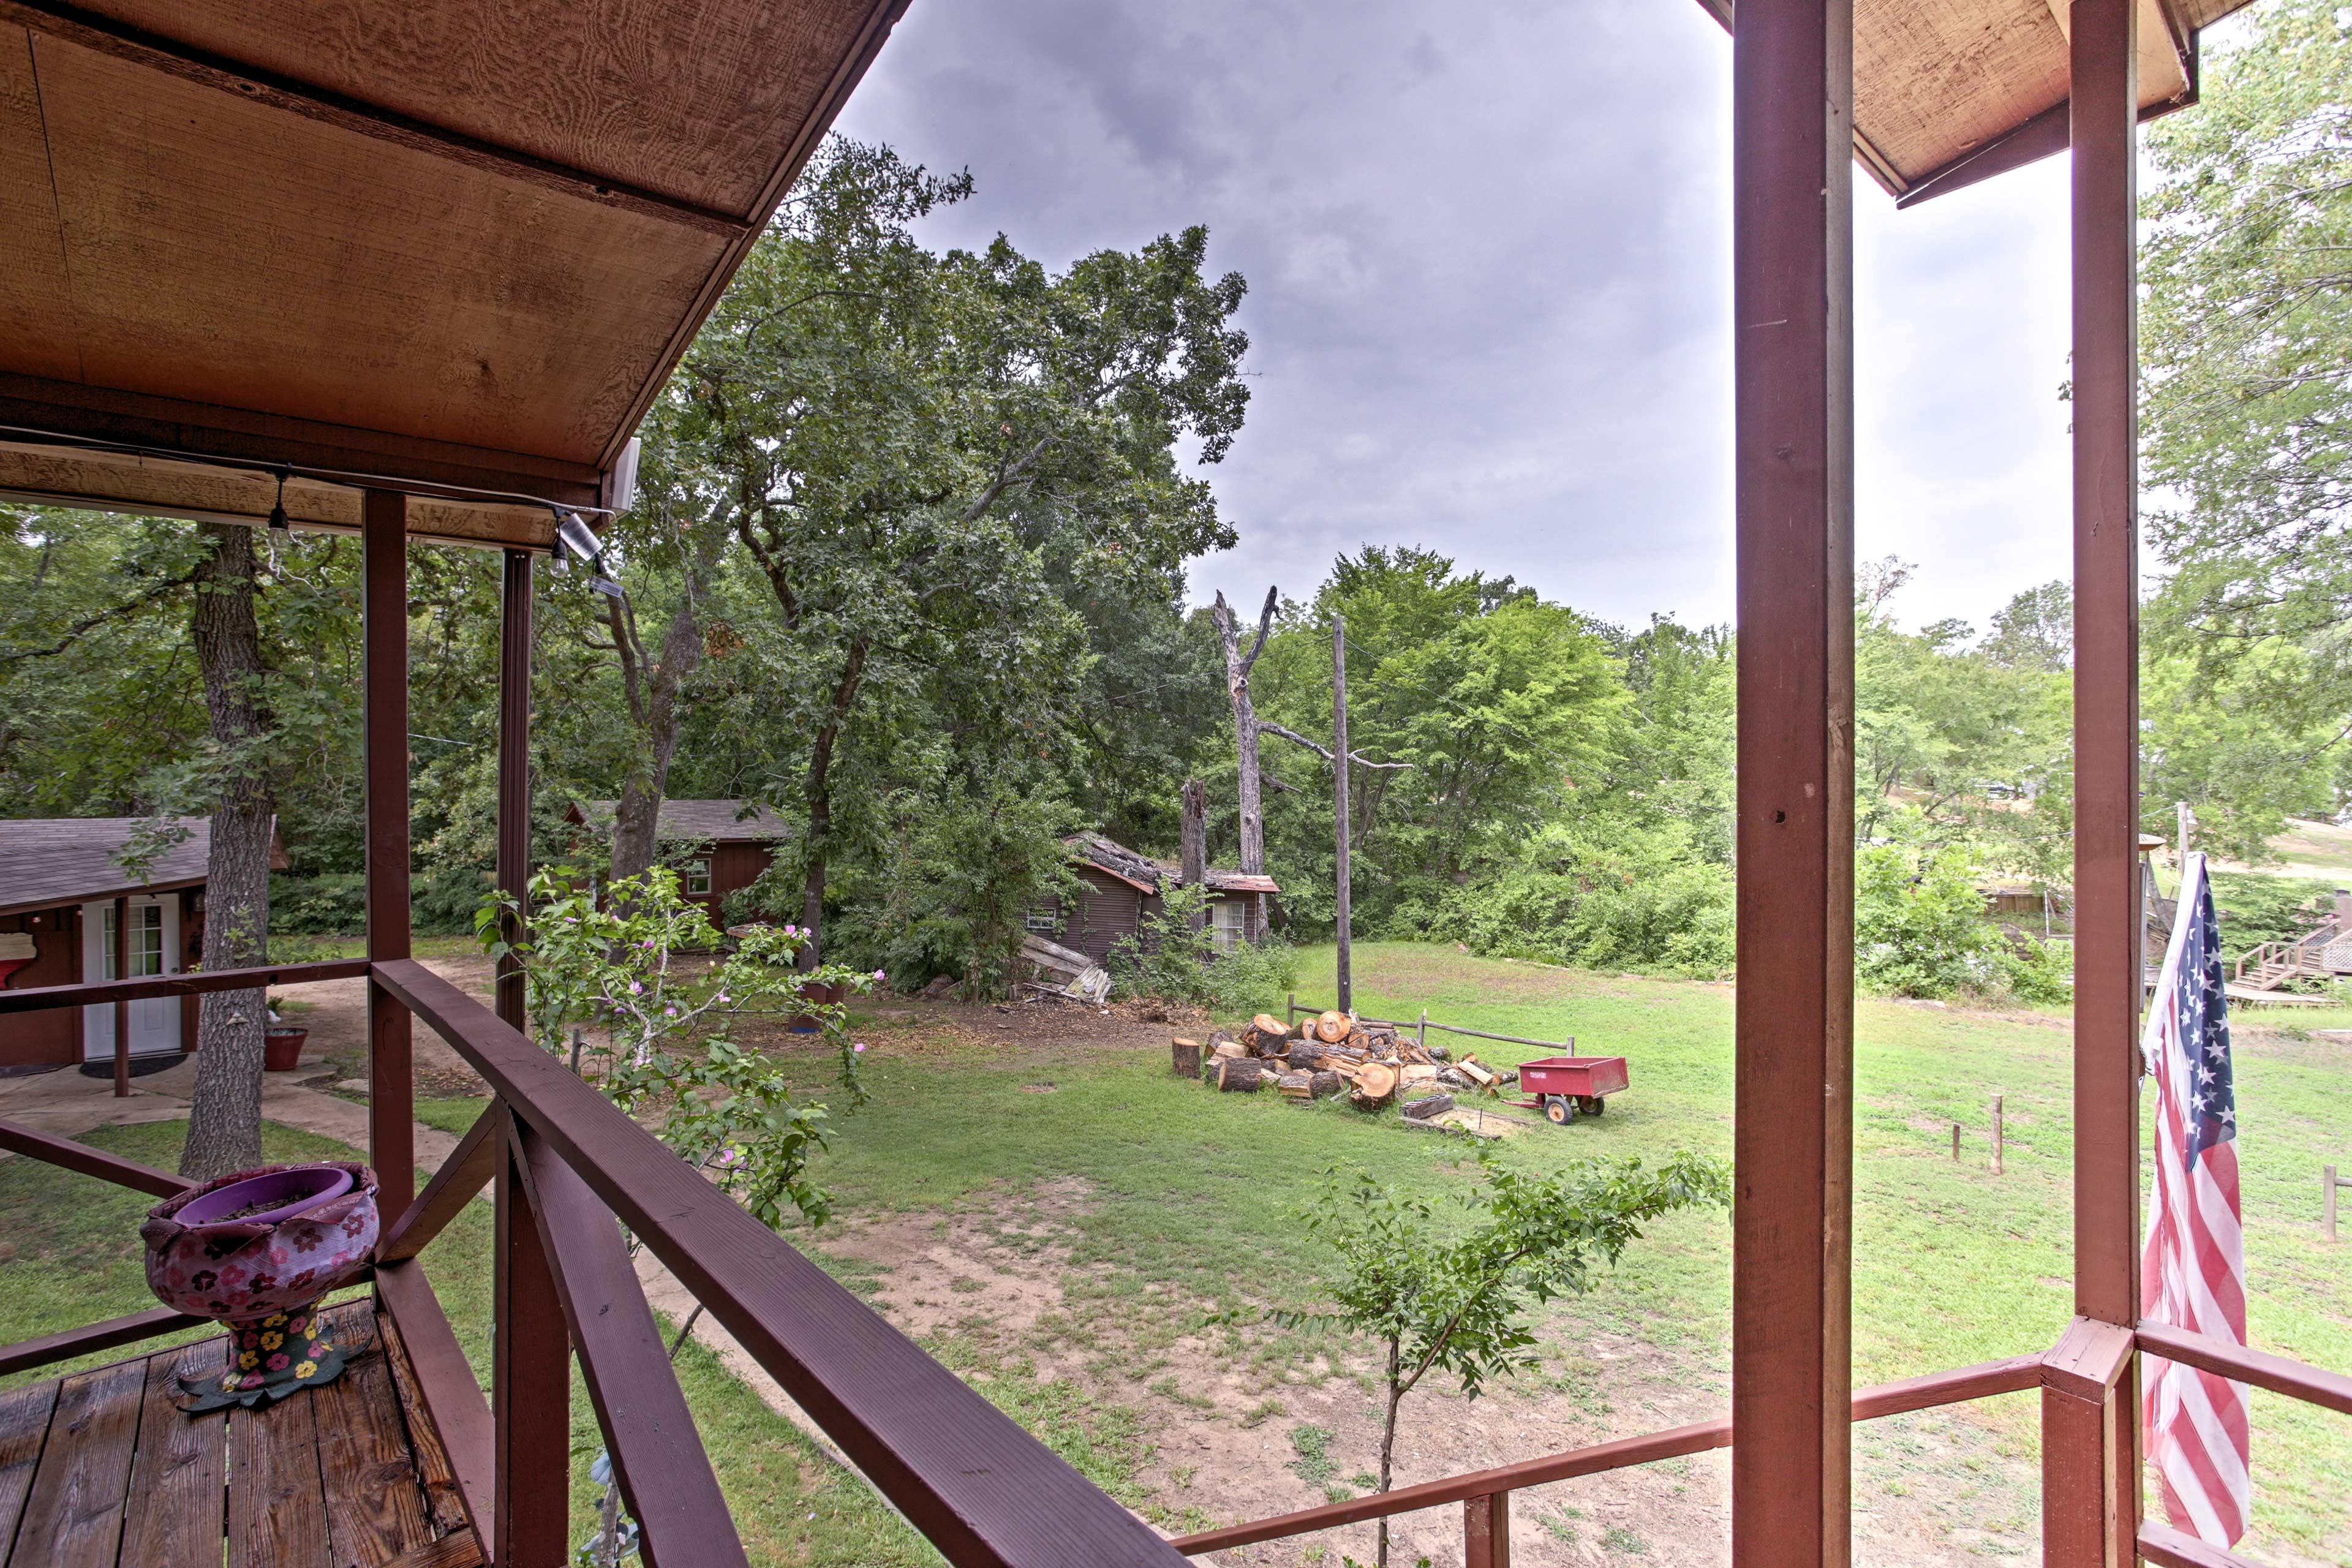 Enjoy the scenic Texas scenery surrounding the property.